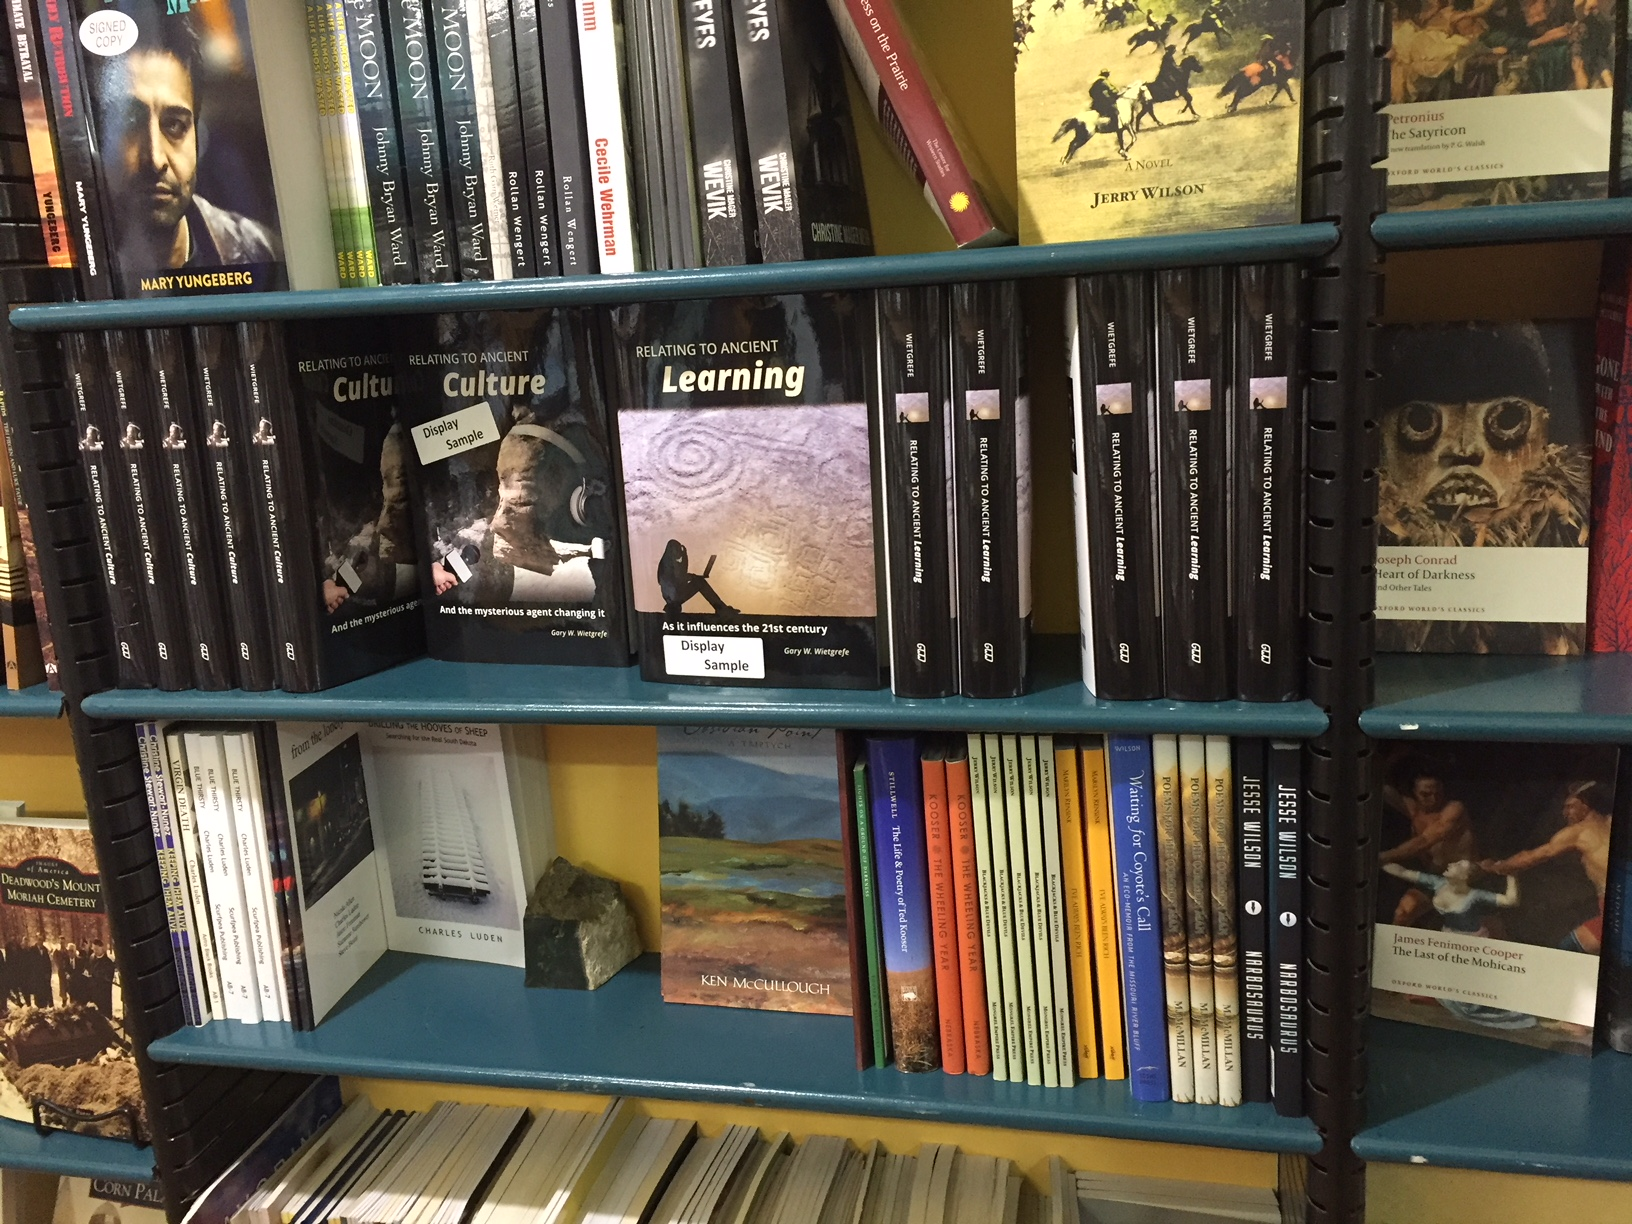 Zandbroz Variety designates whole shelf to Wietgrefe books Sioux Falls 022418.JPG